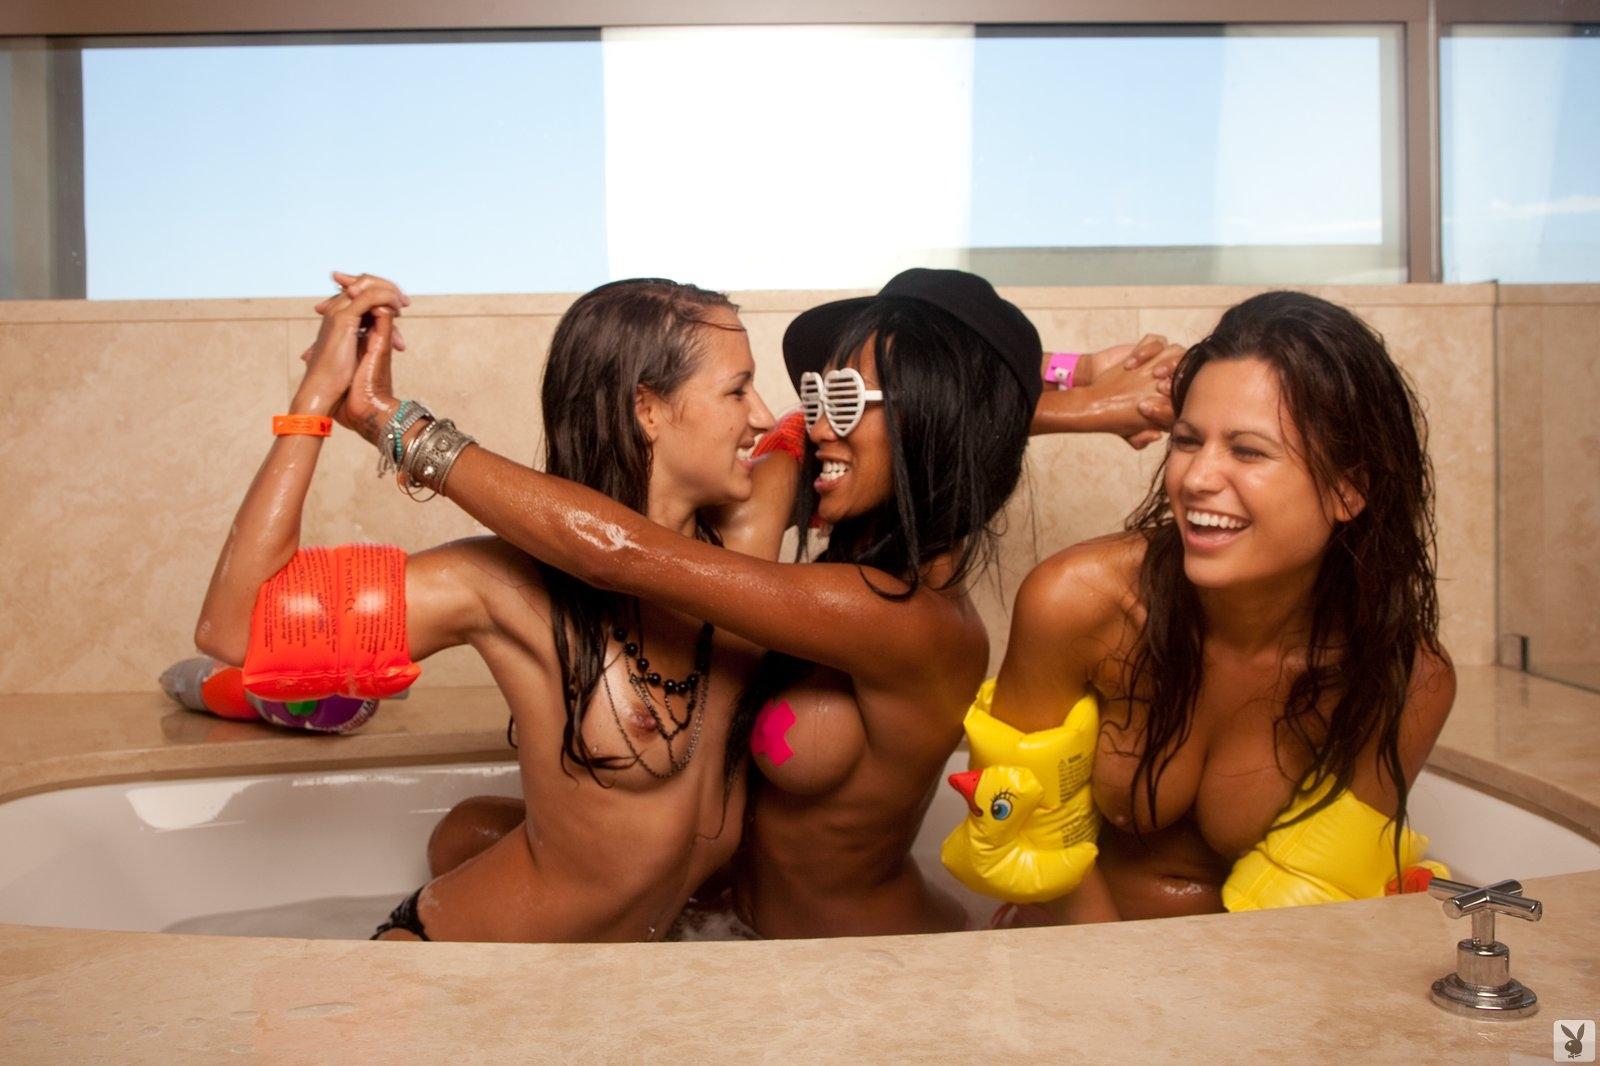 Playboy's Beach House Episode 02 Playboy Plus (3)